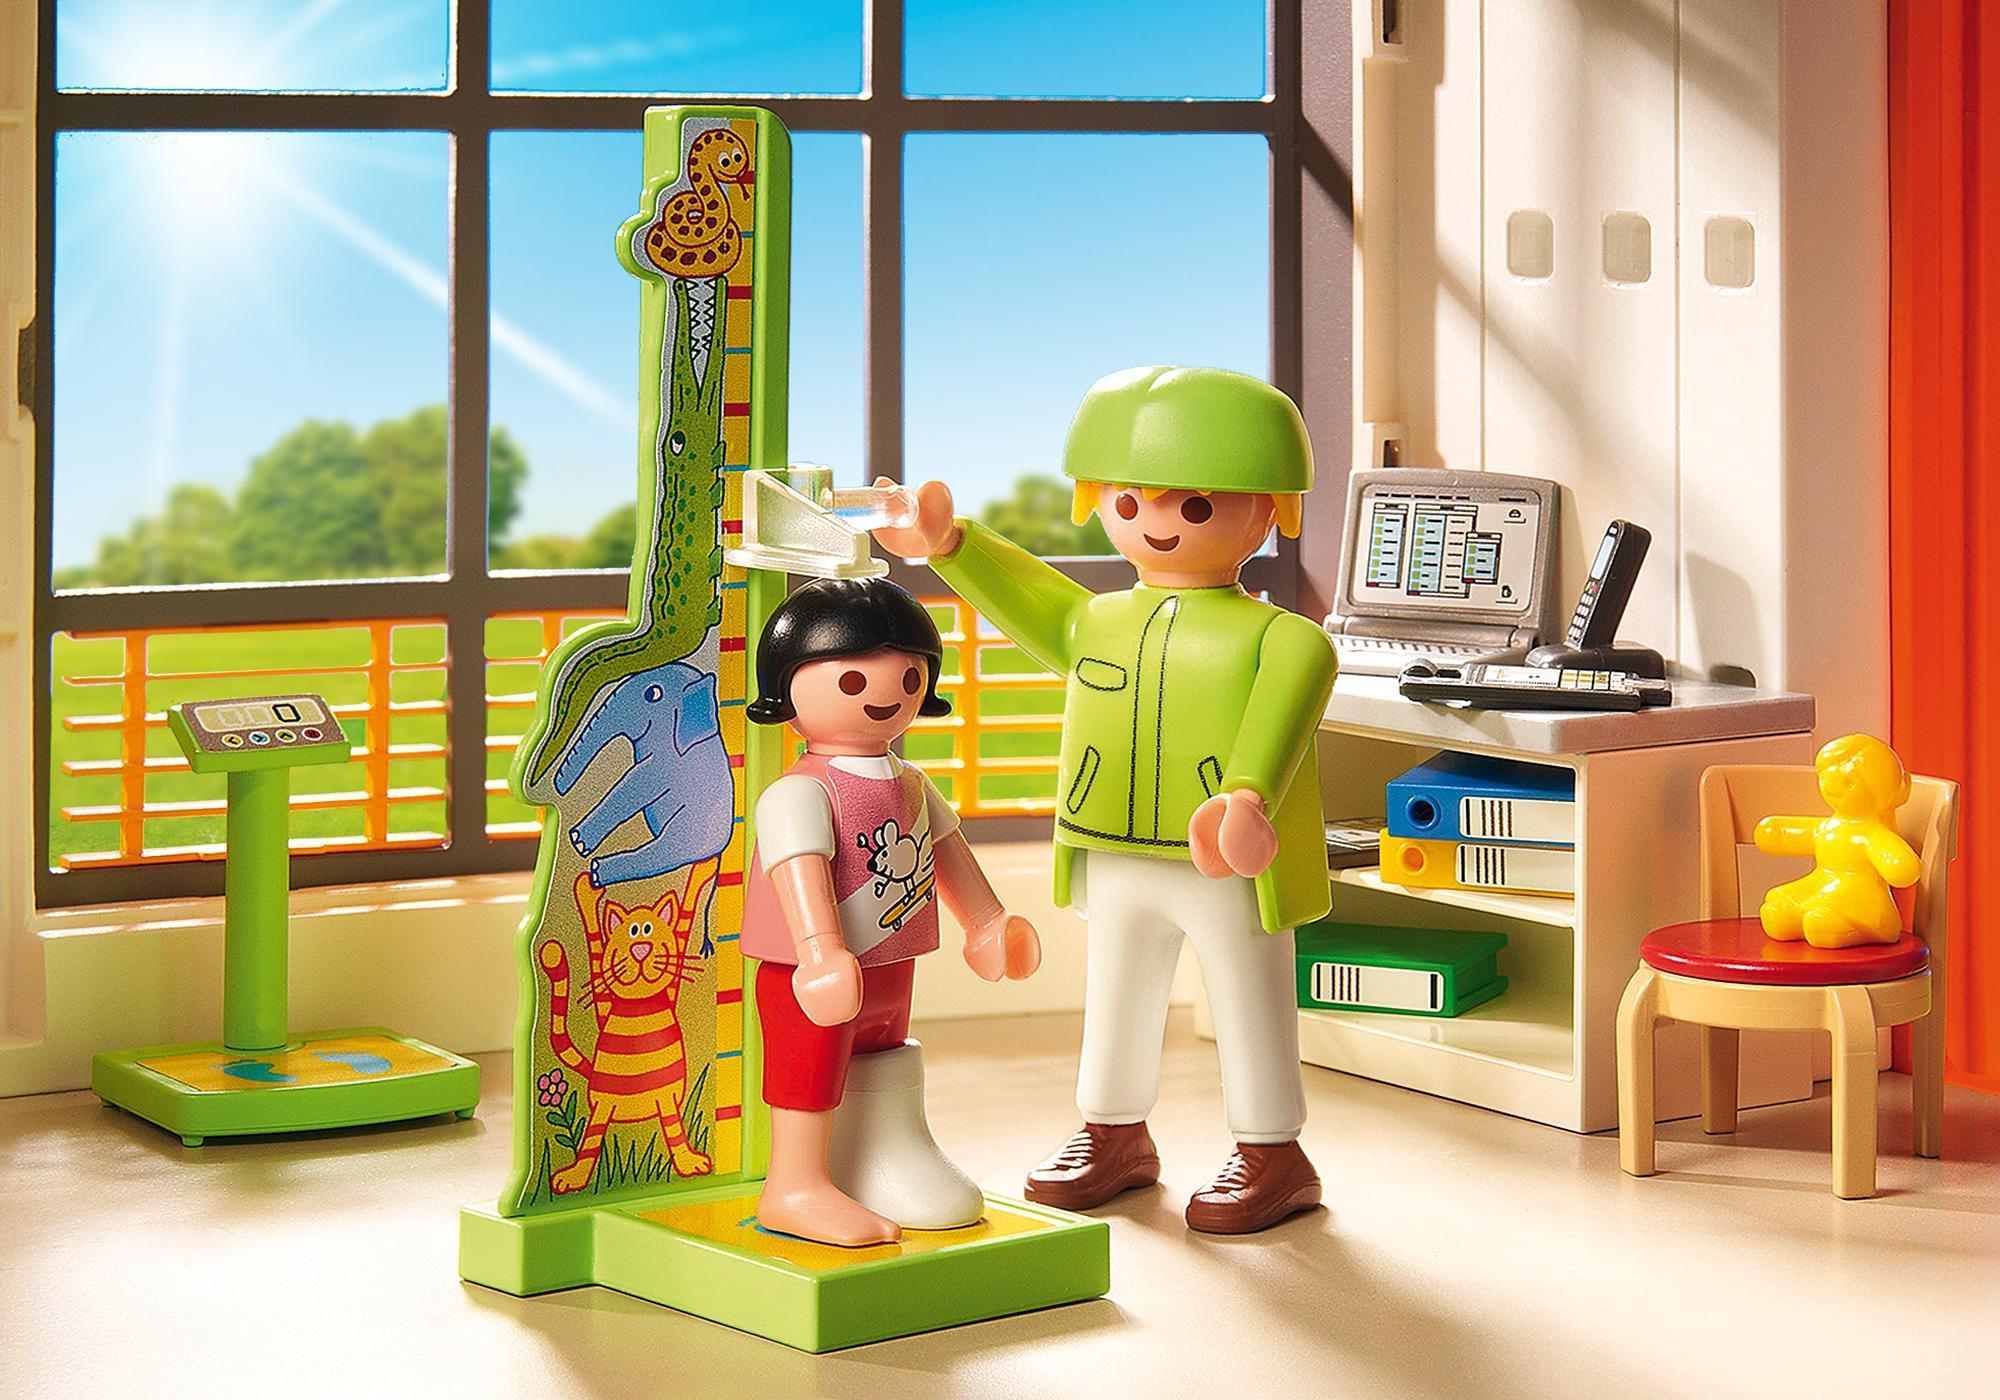 http://media.playmobil.com/i/playmobil/6657_product_extra2/Kinderklinik mit Einrichtung